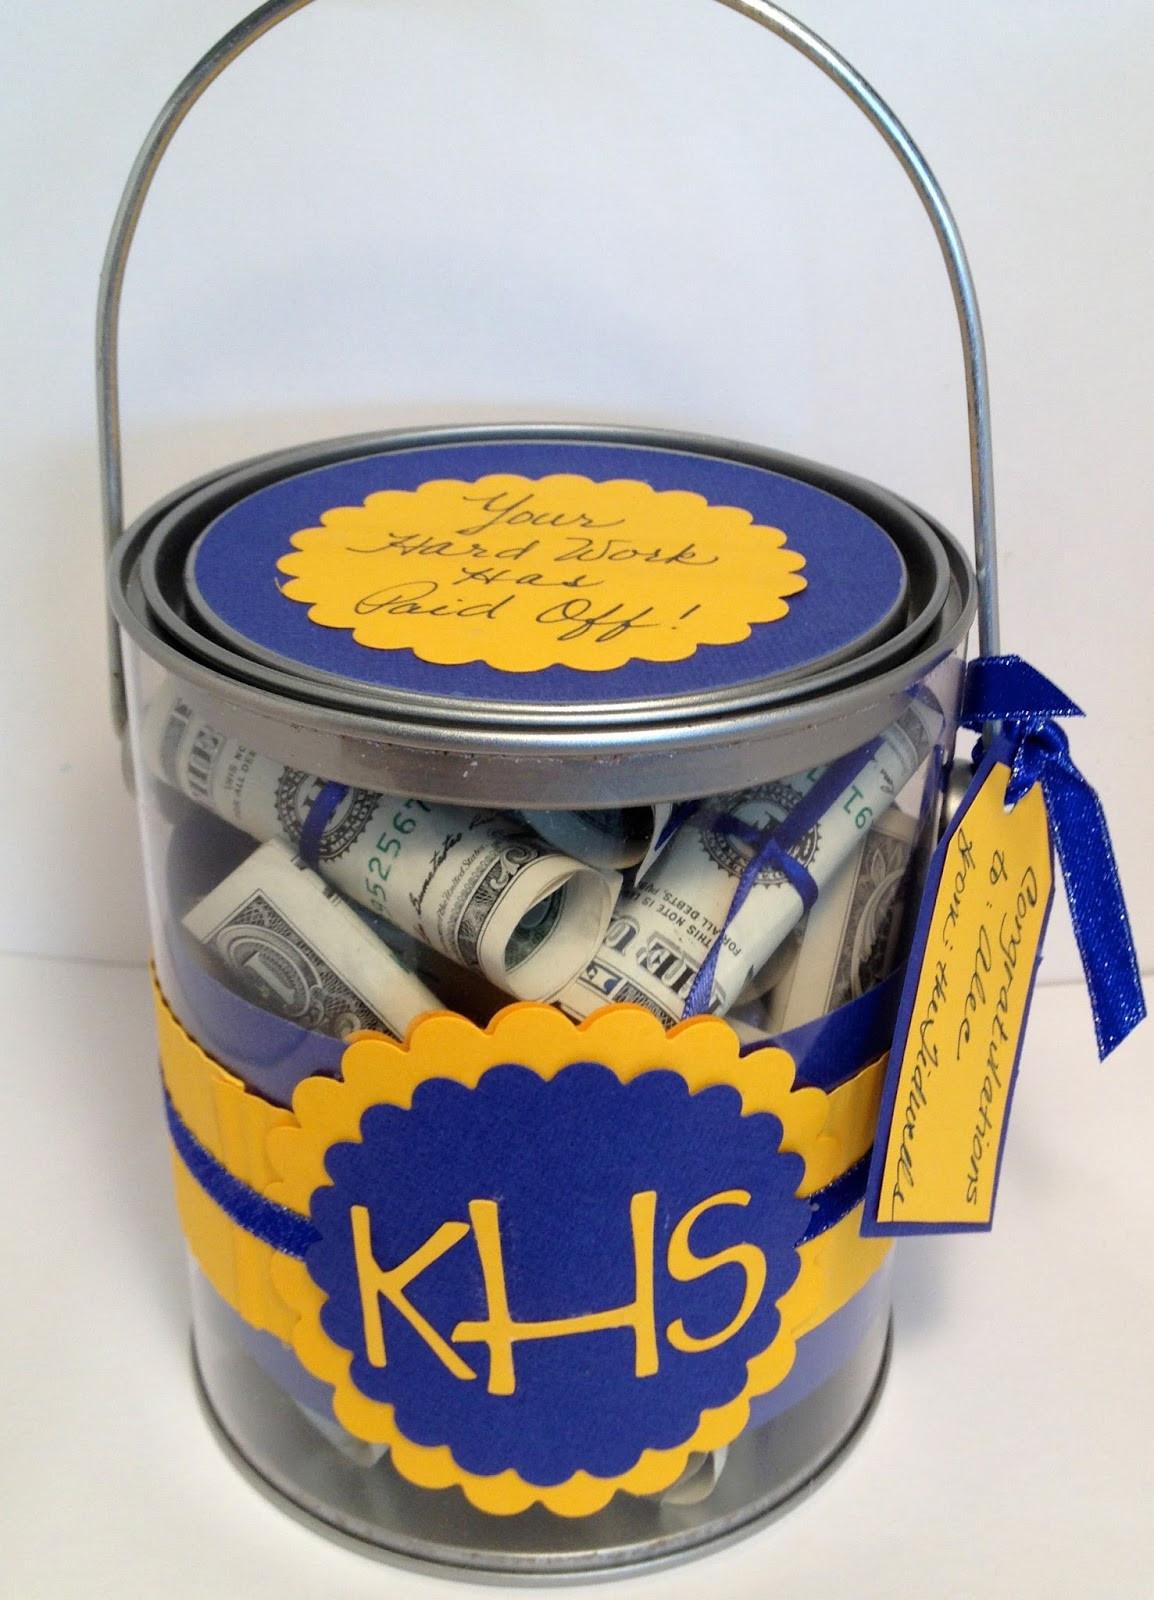 5Th Grade Graduation Gift Ideas For Boys  Artful Musings It s Graduation Time